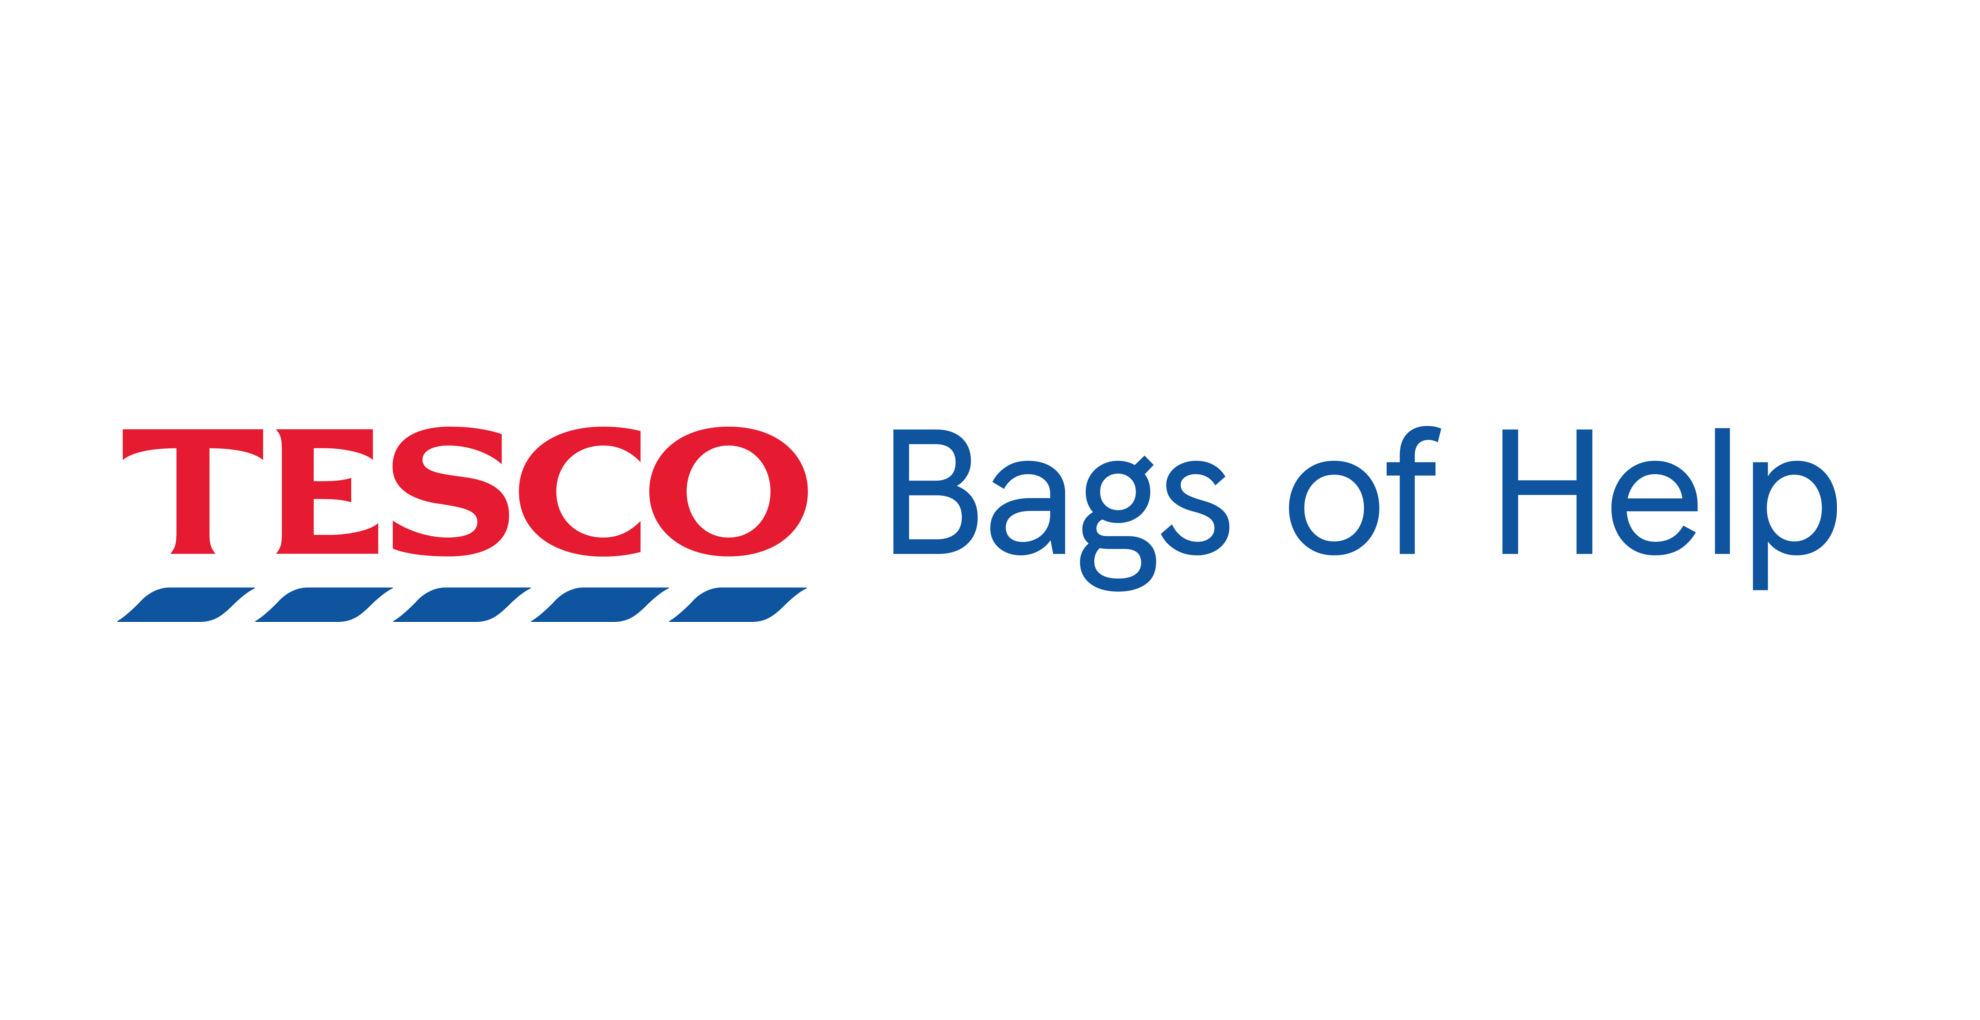 Tesco-Bags-of-help logo